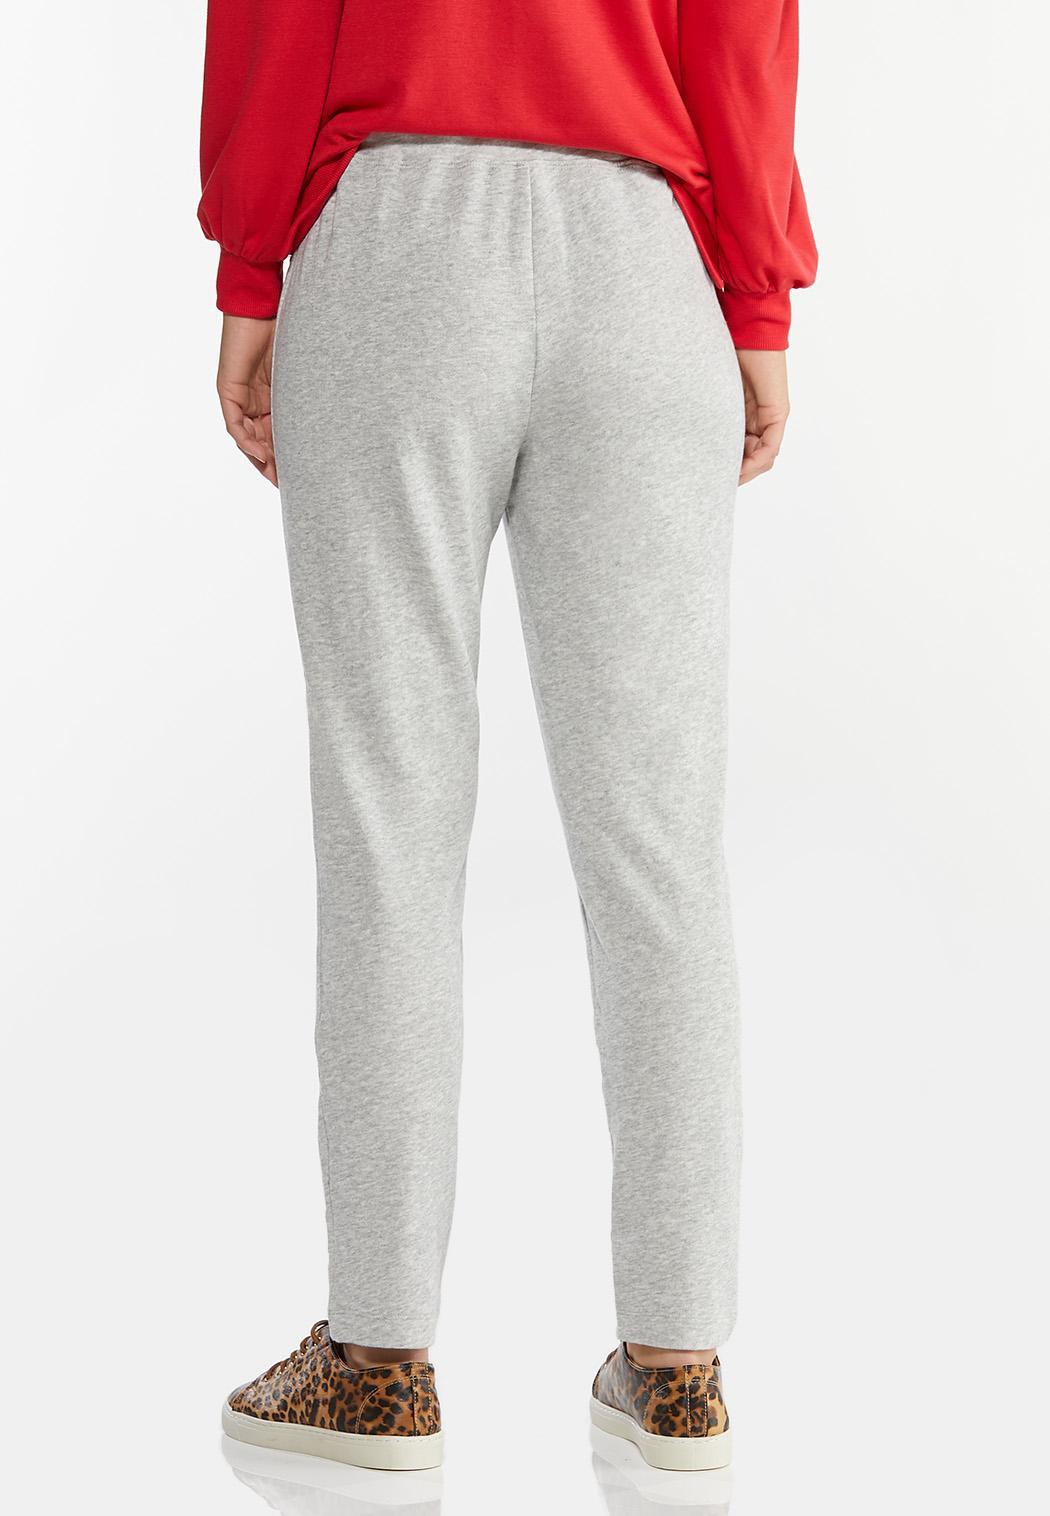 Gray Athleisure Pants (Item #44448104)